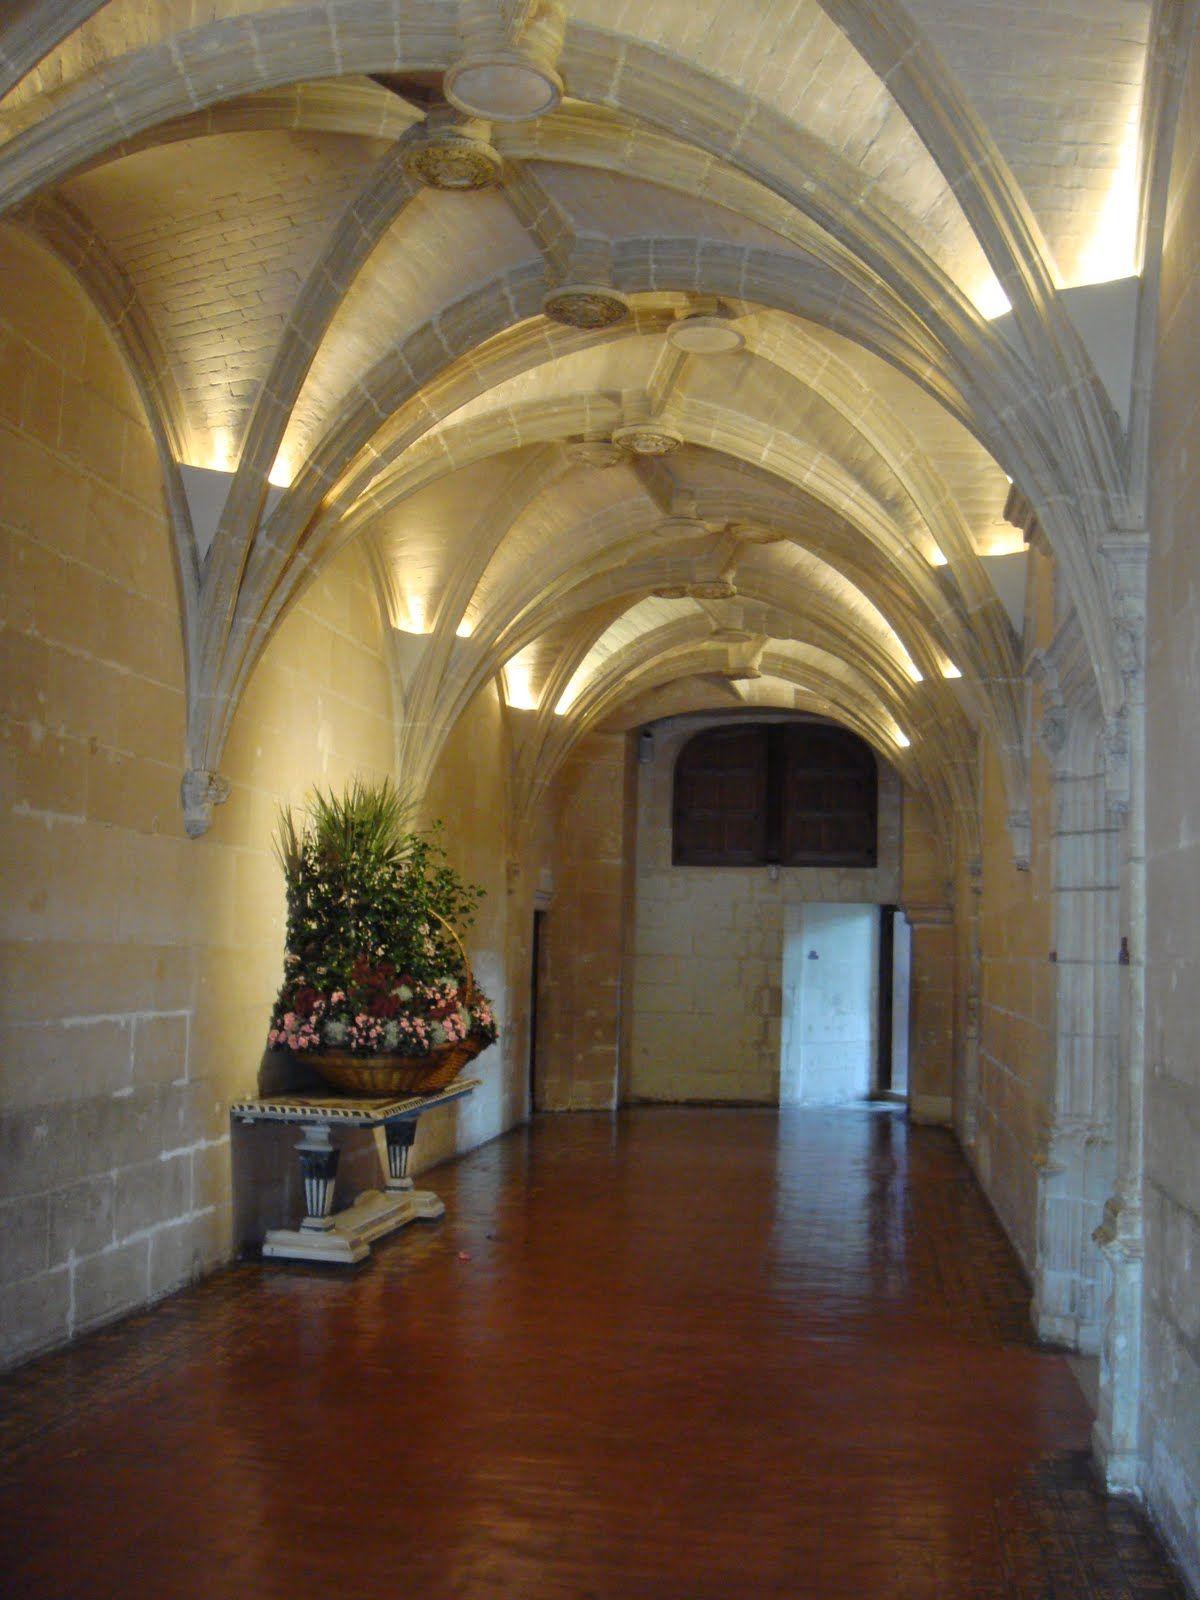 Chateau Chenonceau Interior-entrance | France Chateaux & Gardens ...